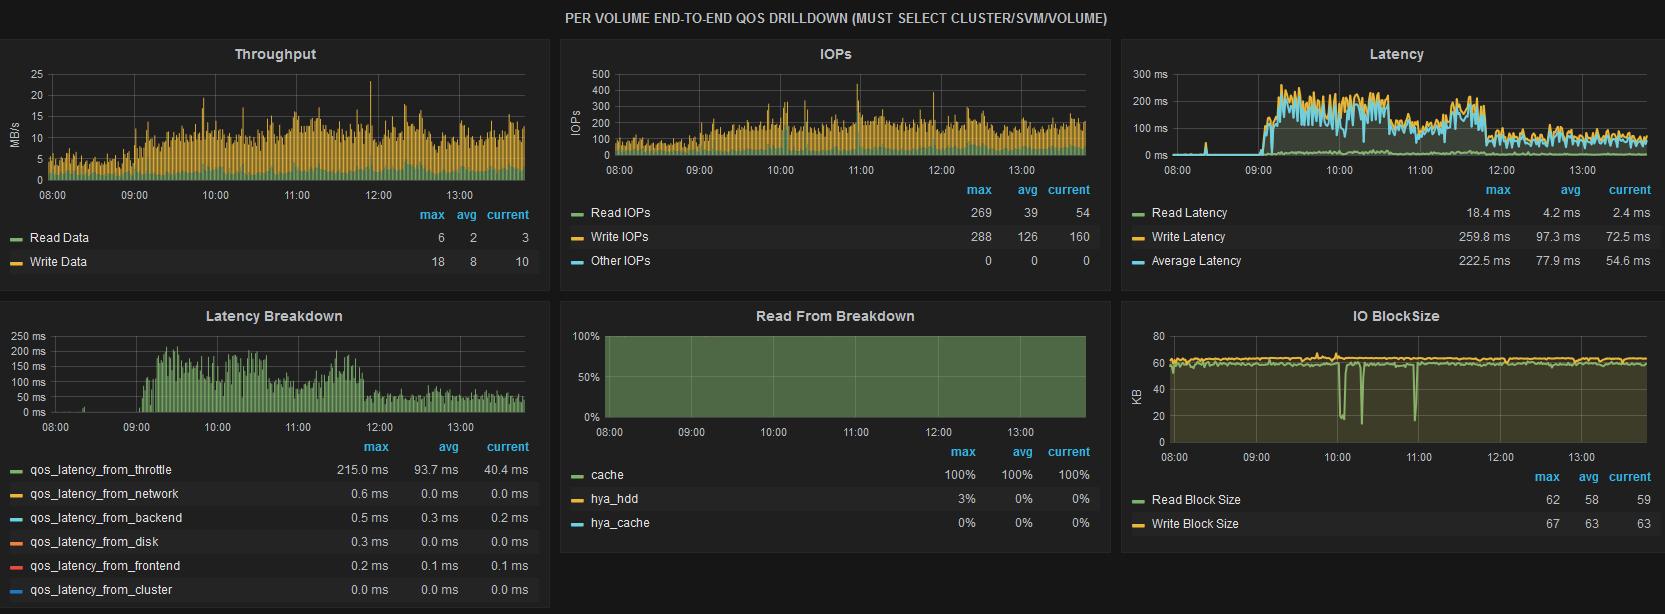 qos_latency.png